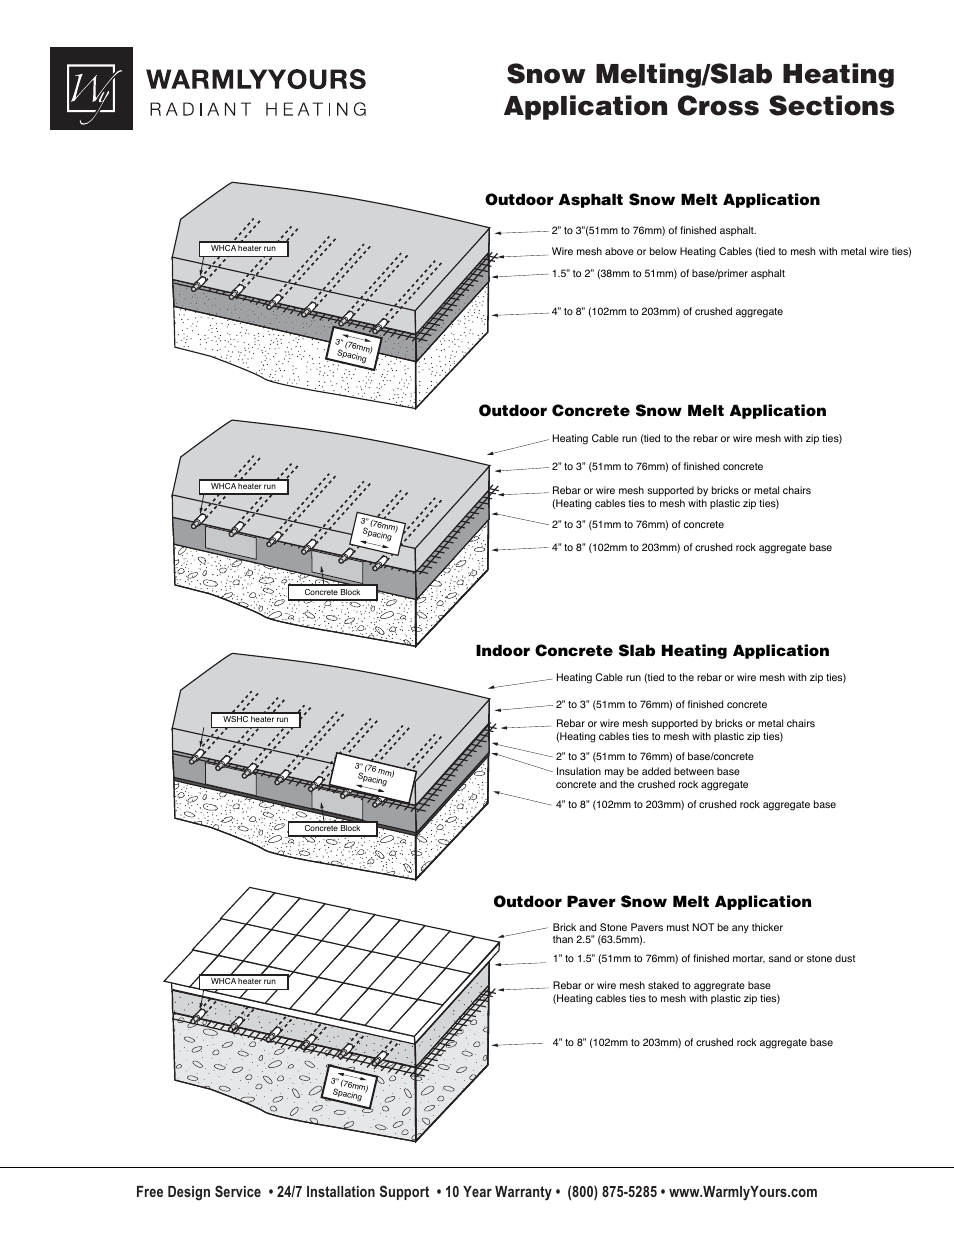 WarmlyYours Snow Melting & Slab Heating Application Cross